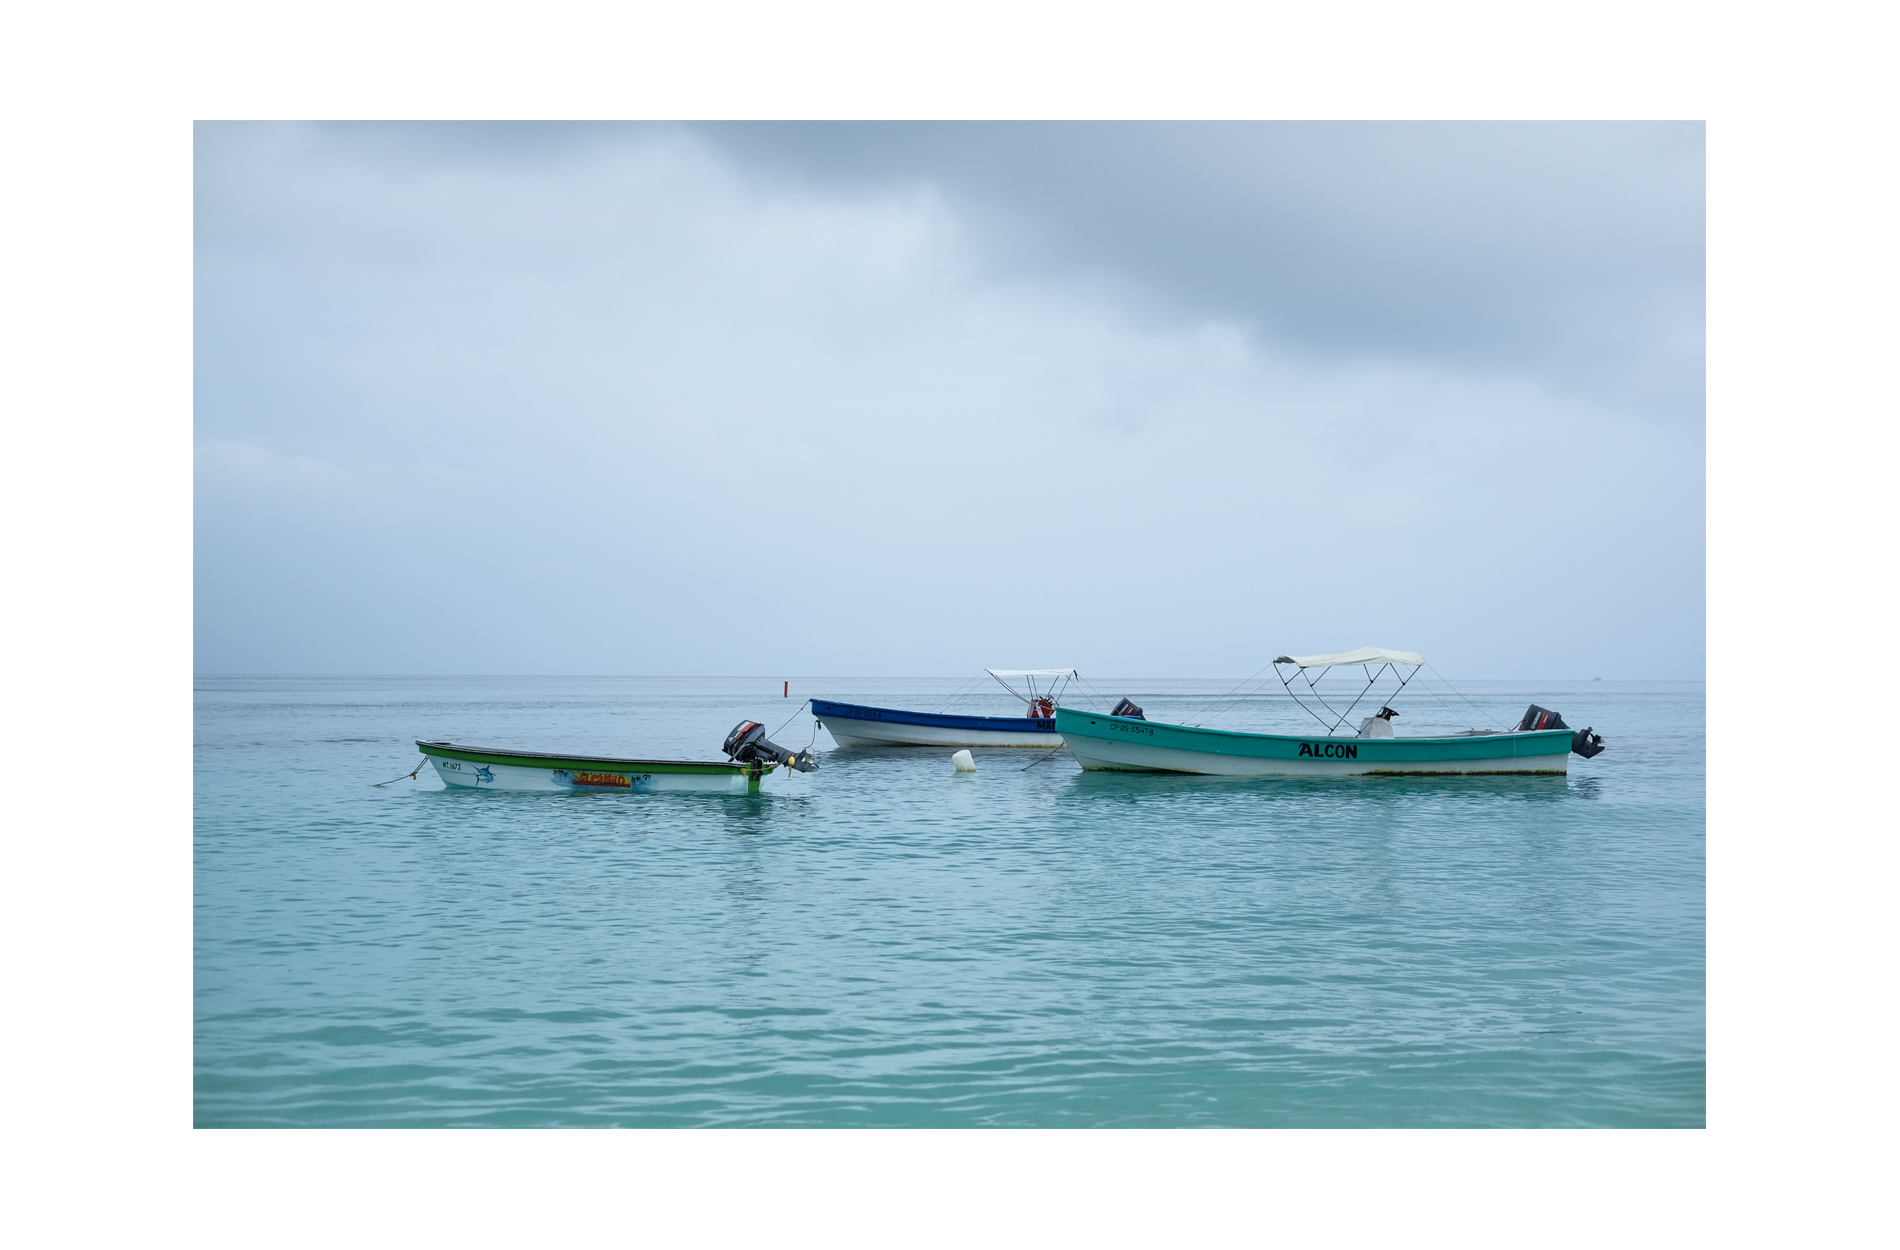 playa blanca paradise boat